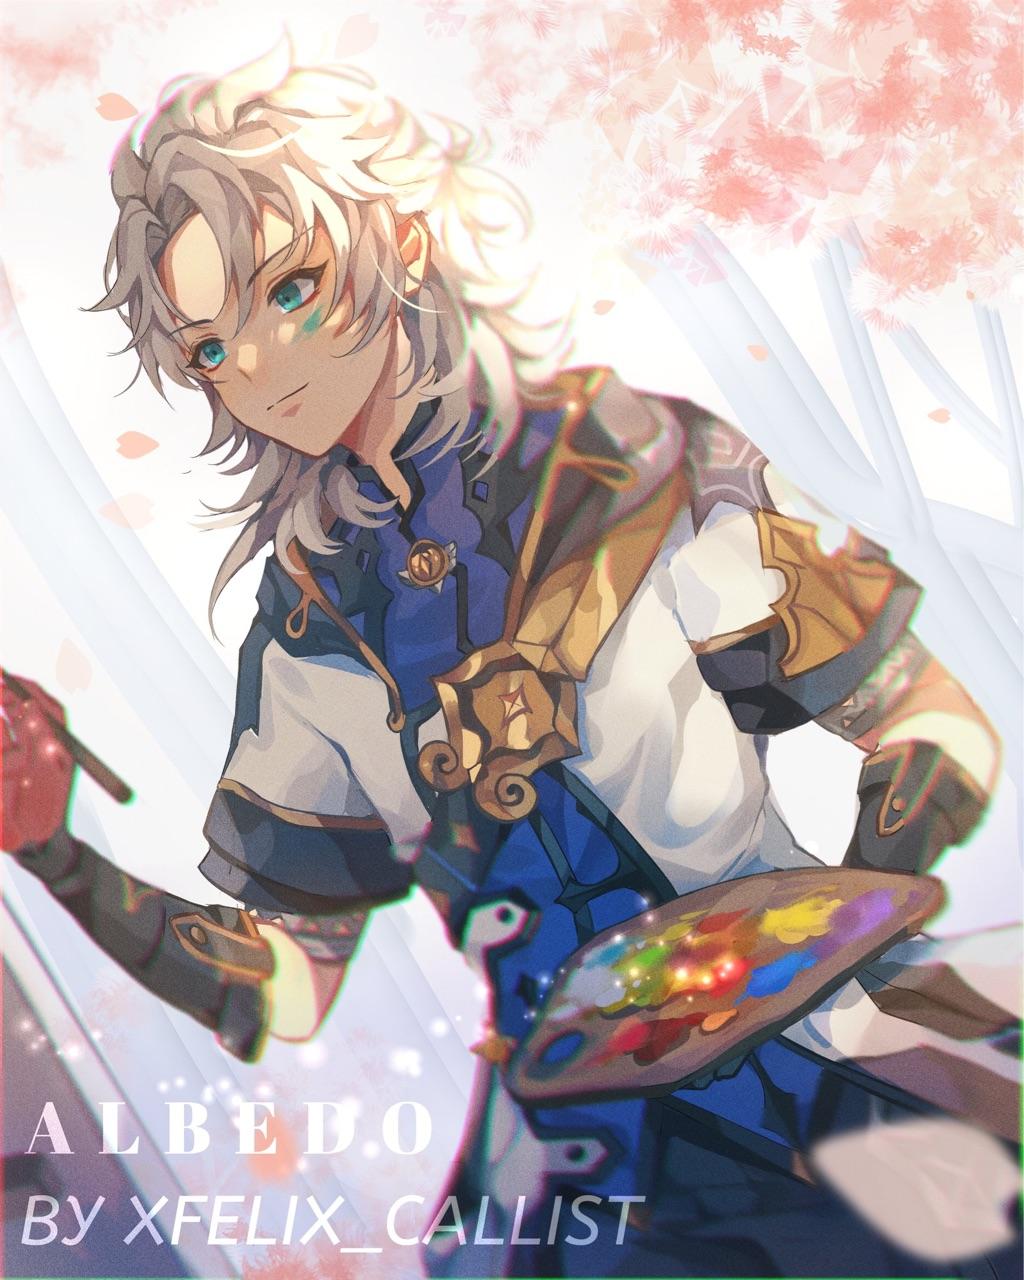 anime, video game, and albedo image